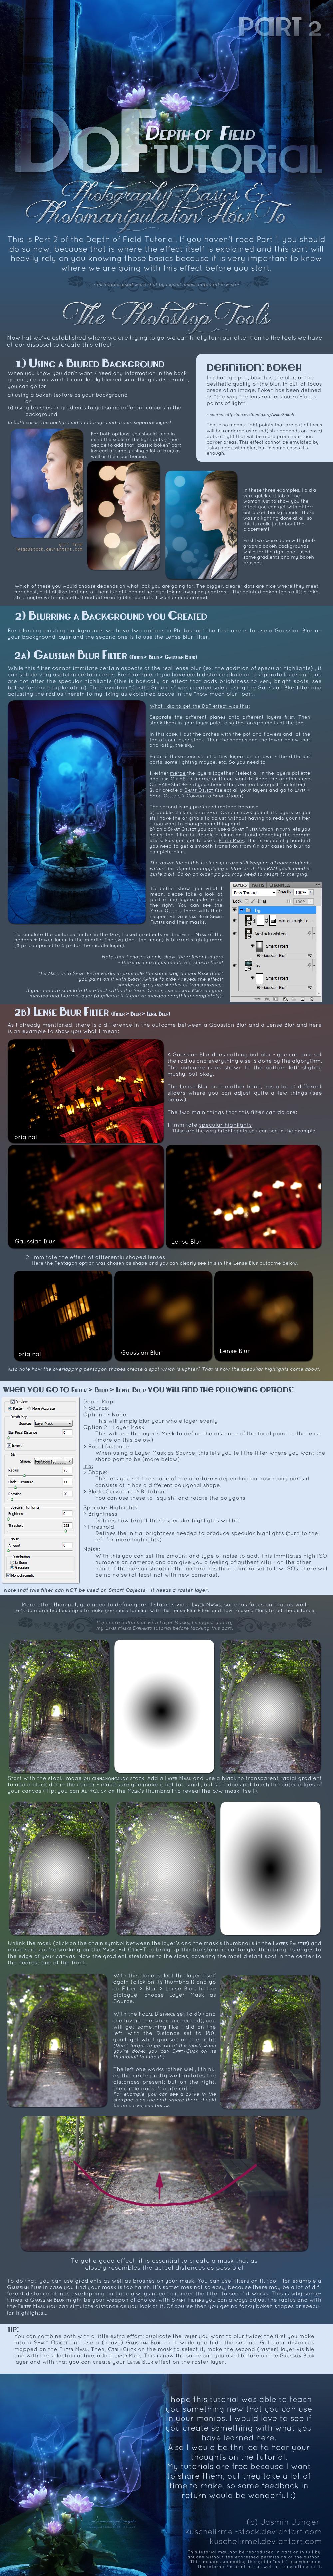 Depth of Field Photomanipulation Tutorial Part 2